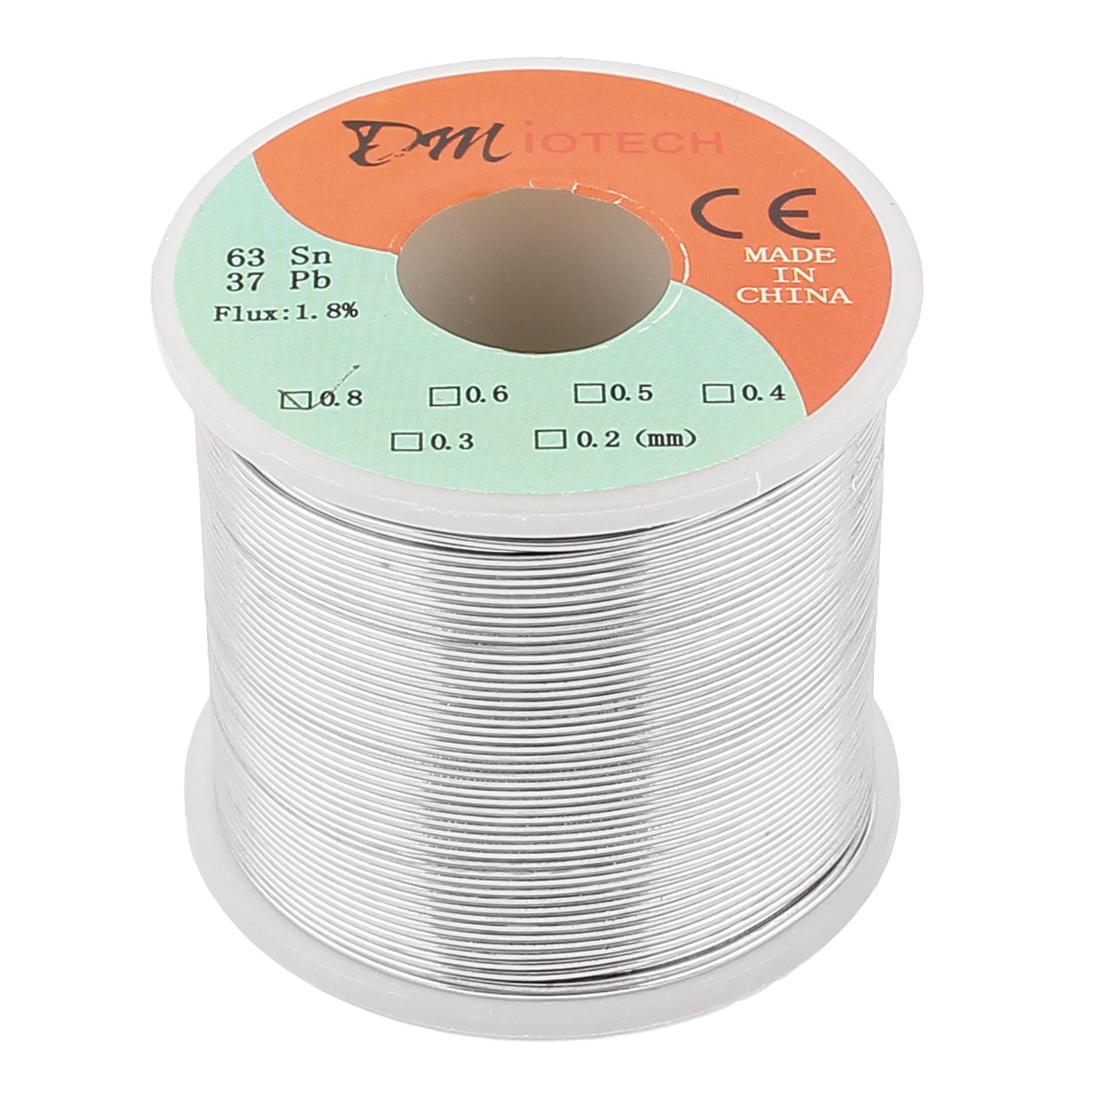 0.8mm 400G 63/37 Rosin Core Flux 1.8% Tin Lead Roll Soldering Wire